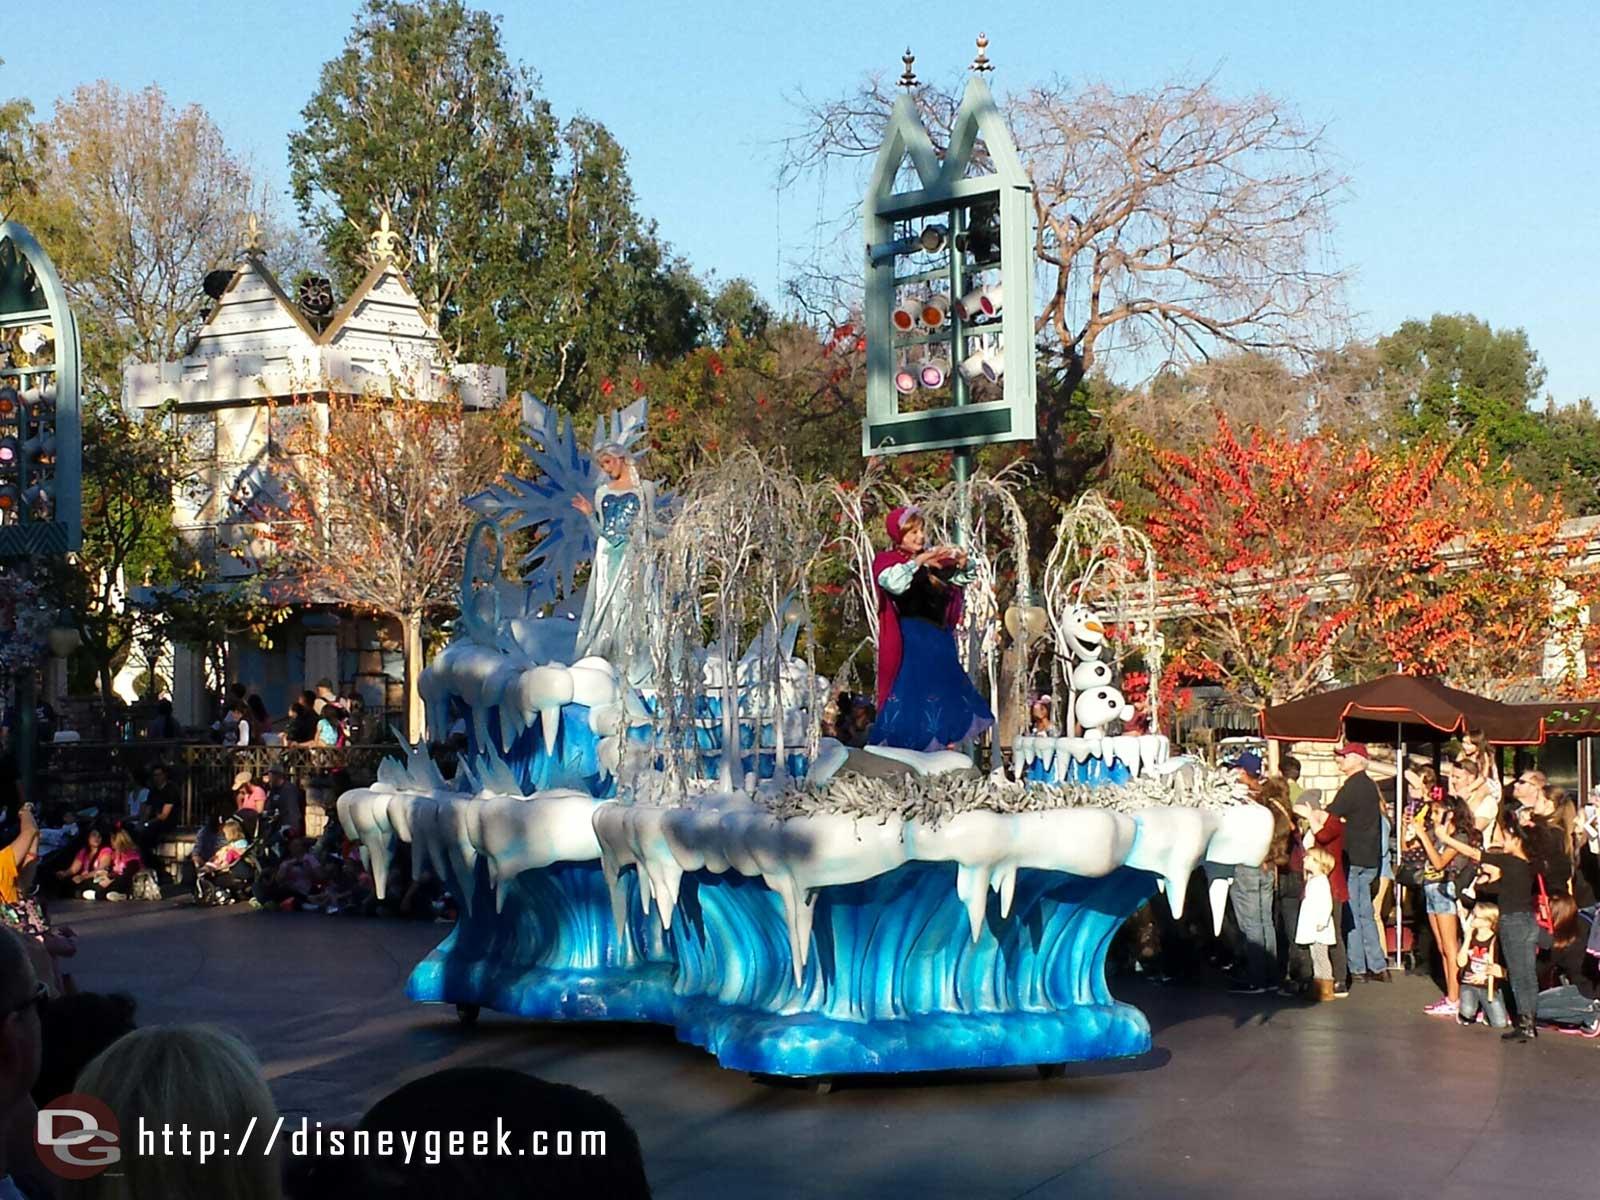 The #Frozen pre-parade float #Disneyland